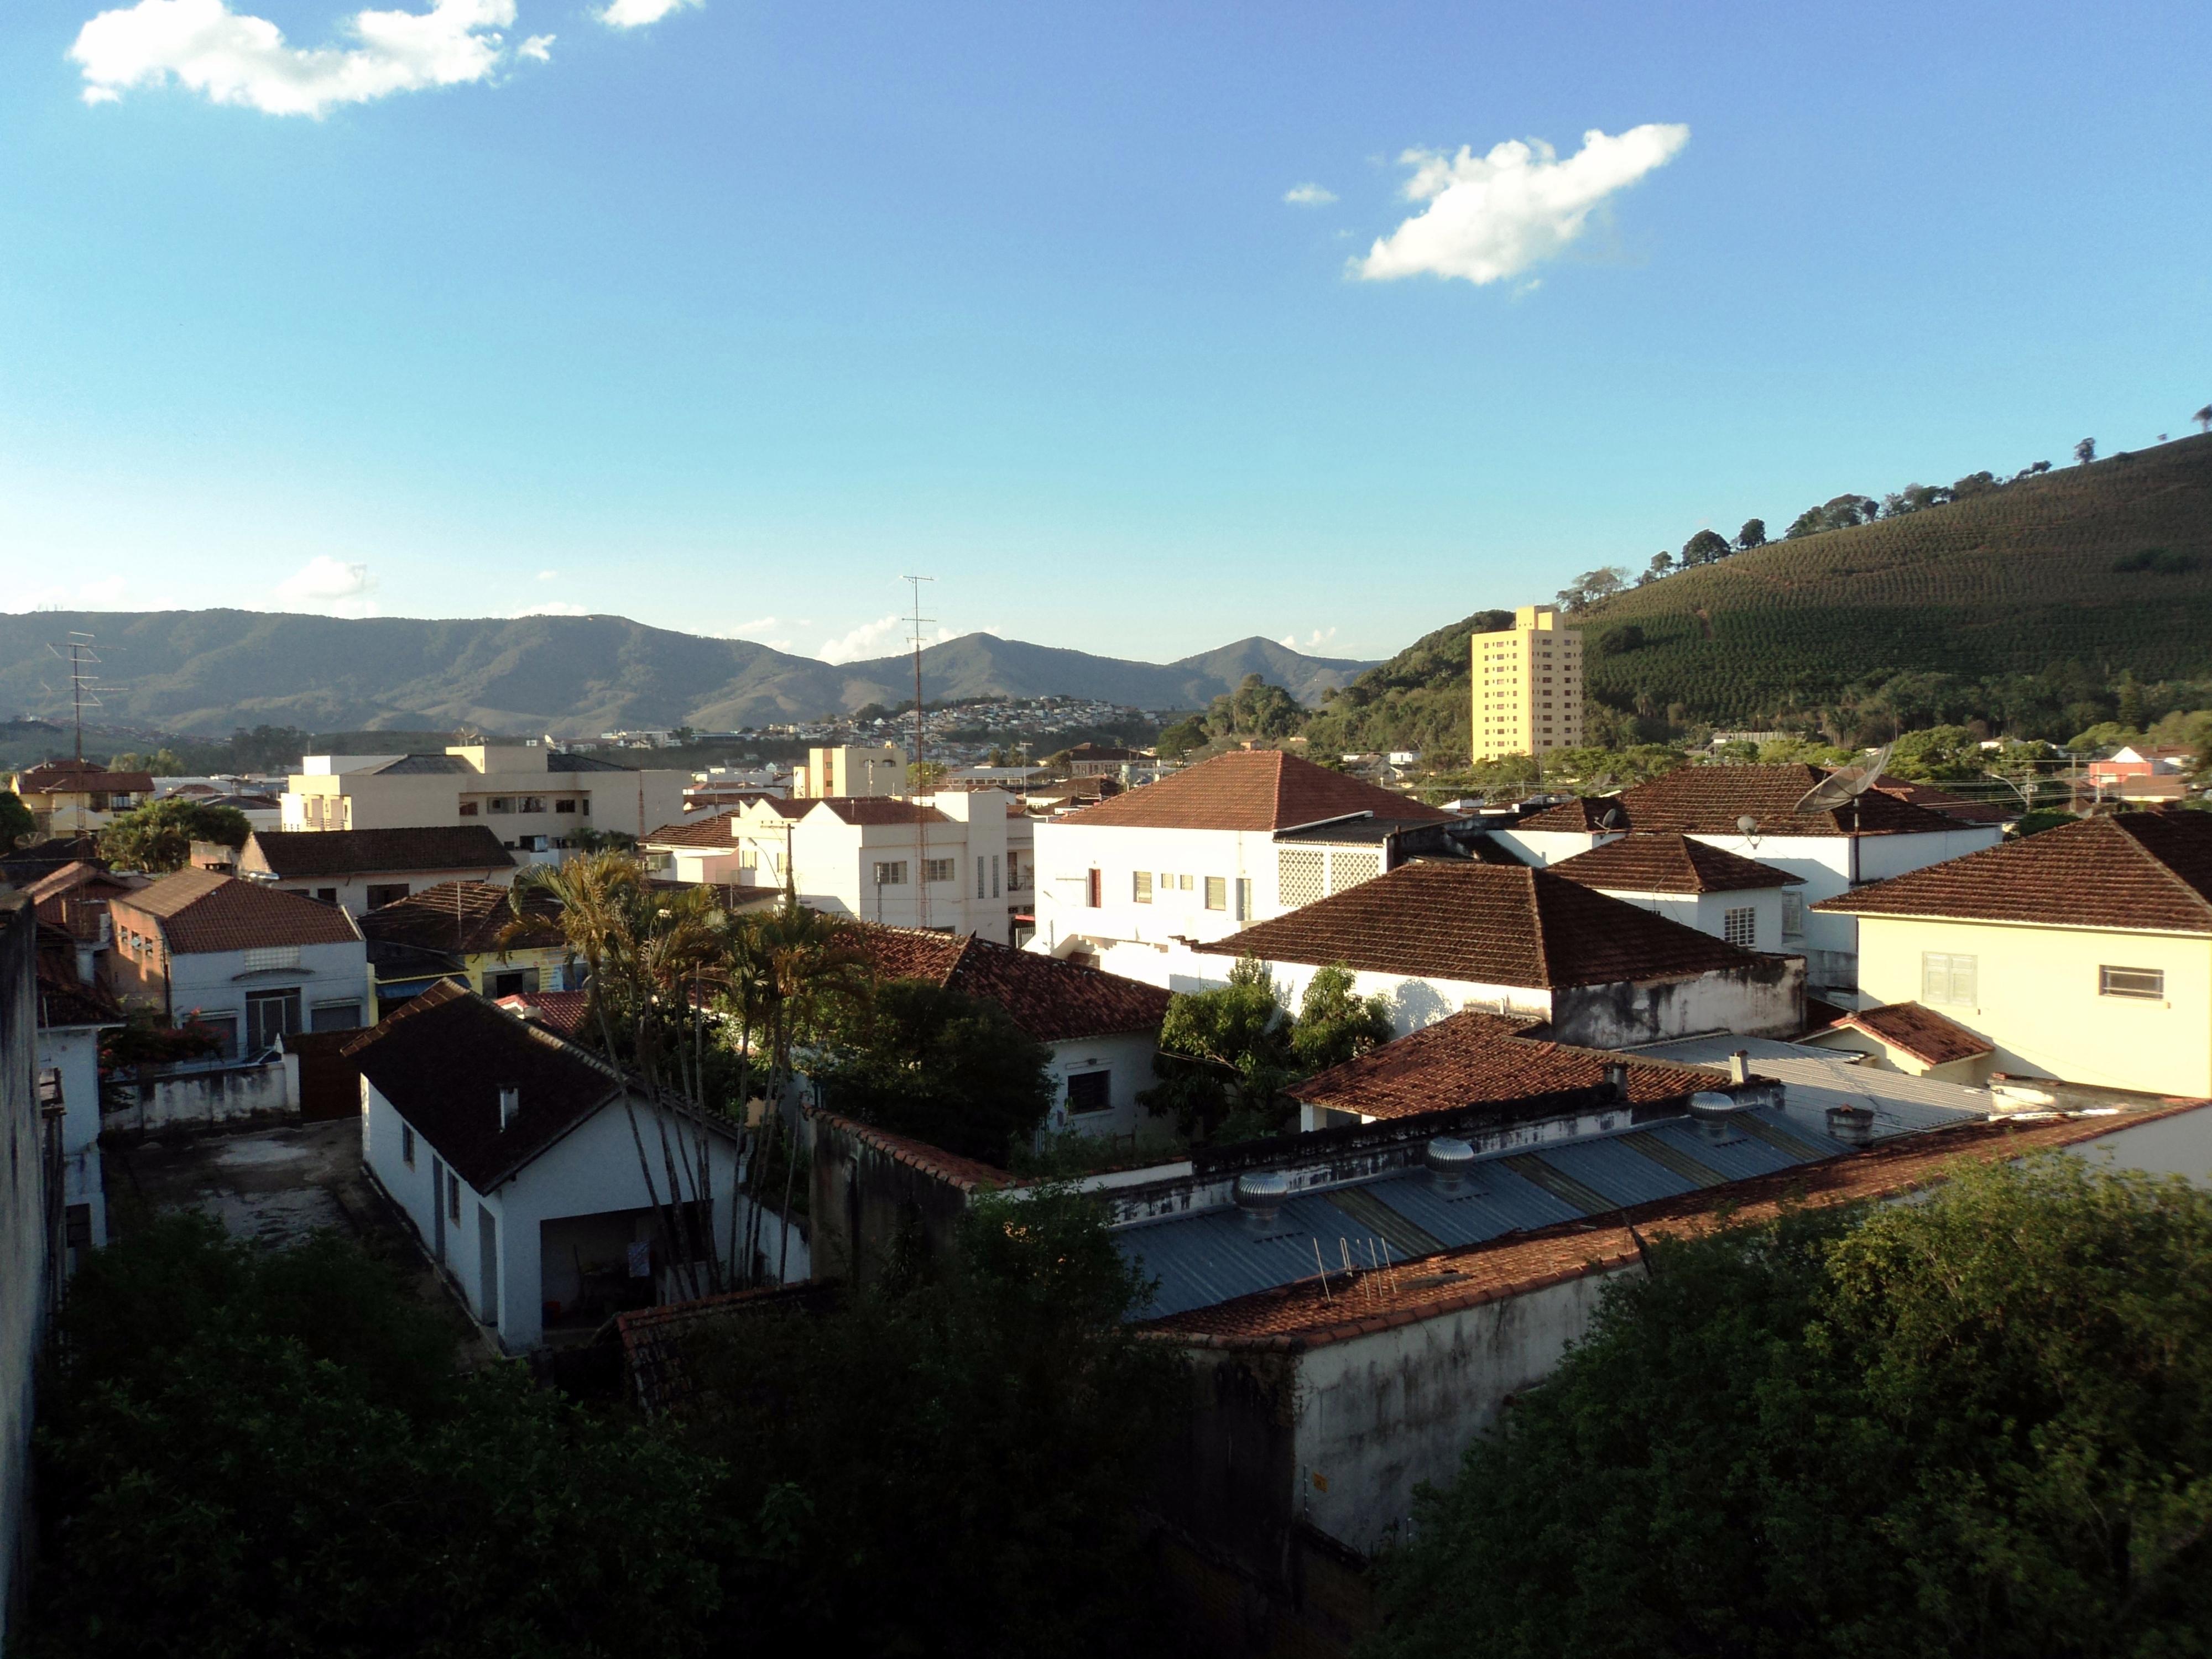 Santa Rita de Minas Minas Gerais fonte: upload.wikimedia.org